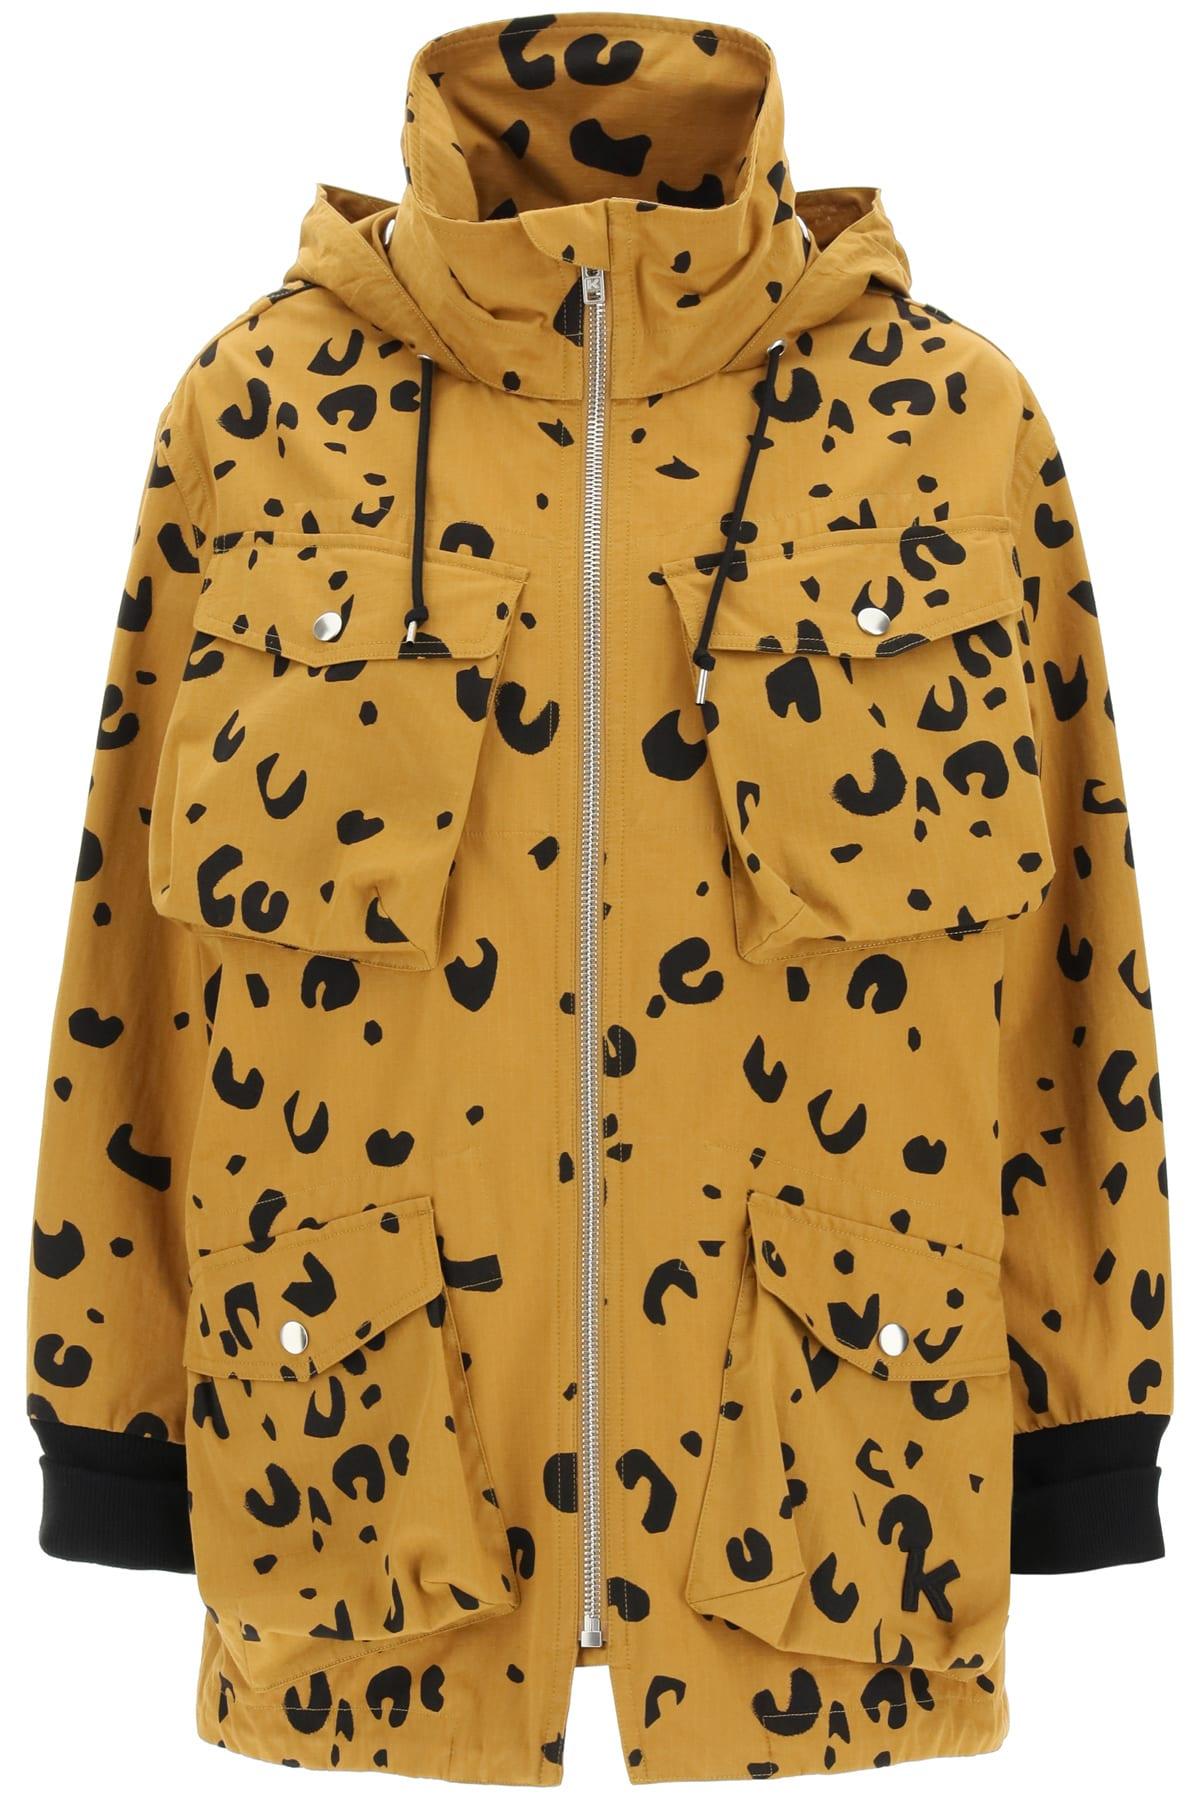 Kenzo Bomber jackets CHEETAH PRINT PARKA